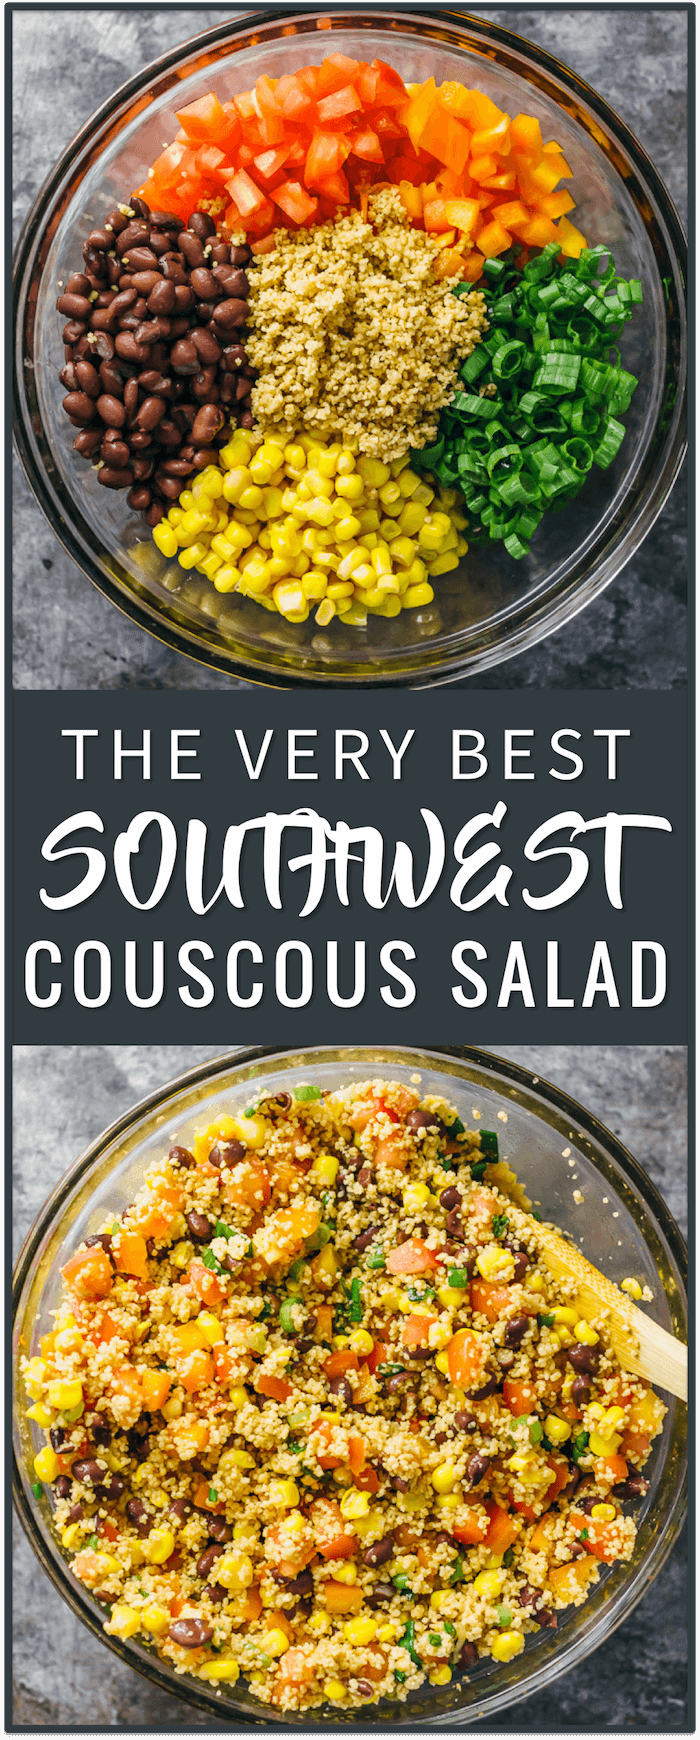 couscous cous cous salad   easy salad recipe   southwest salad recipe   vegetarian   party recipe   appetizer dish side dish recipe, cous cous salad recipes, cold cous cous salad, israeli cous cous, onions, greek mediterranean, pearl cous cous salad, healthy, summer, feta, chicken, moroccan